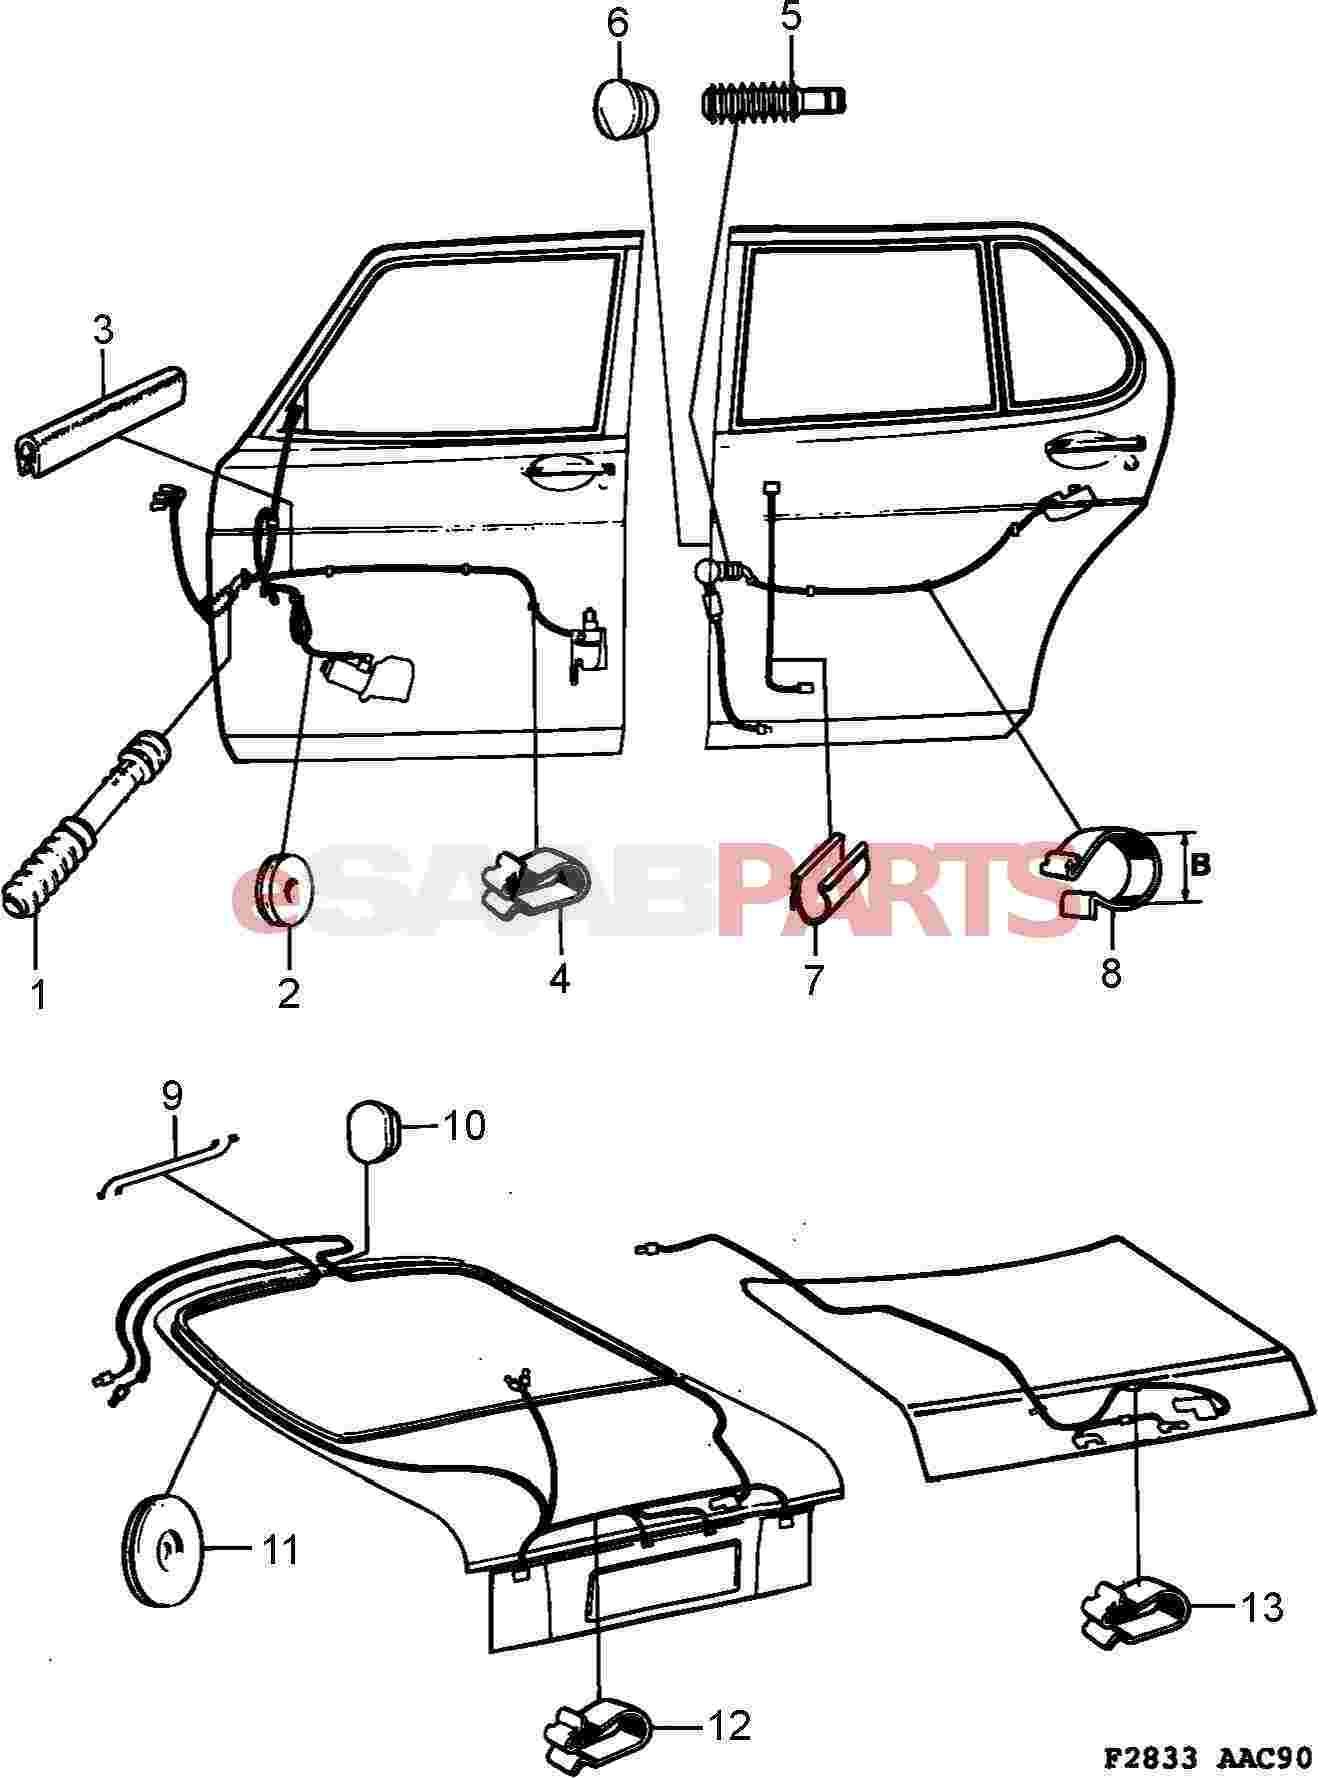 1991 Gmc 1500 Ke Light Wiring Diagram. Fuse Box. Auto